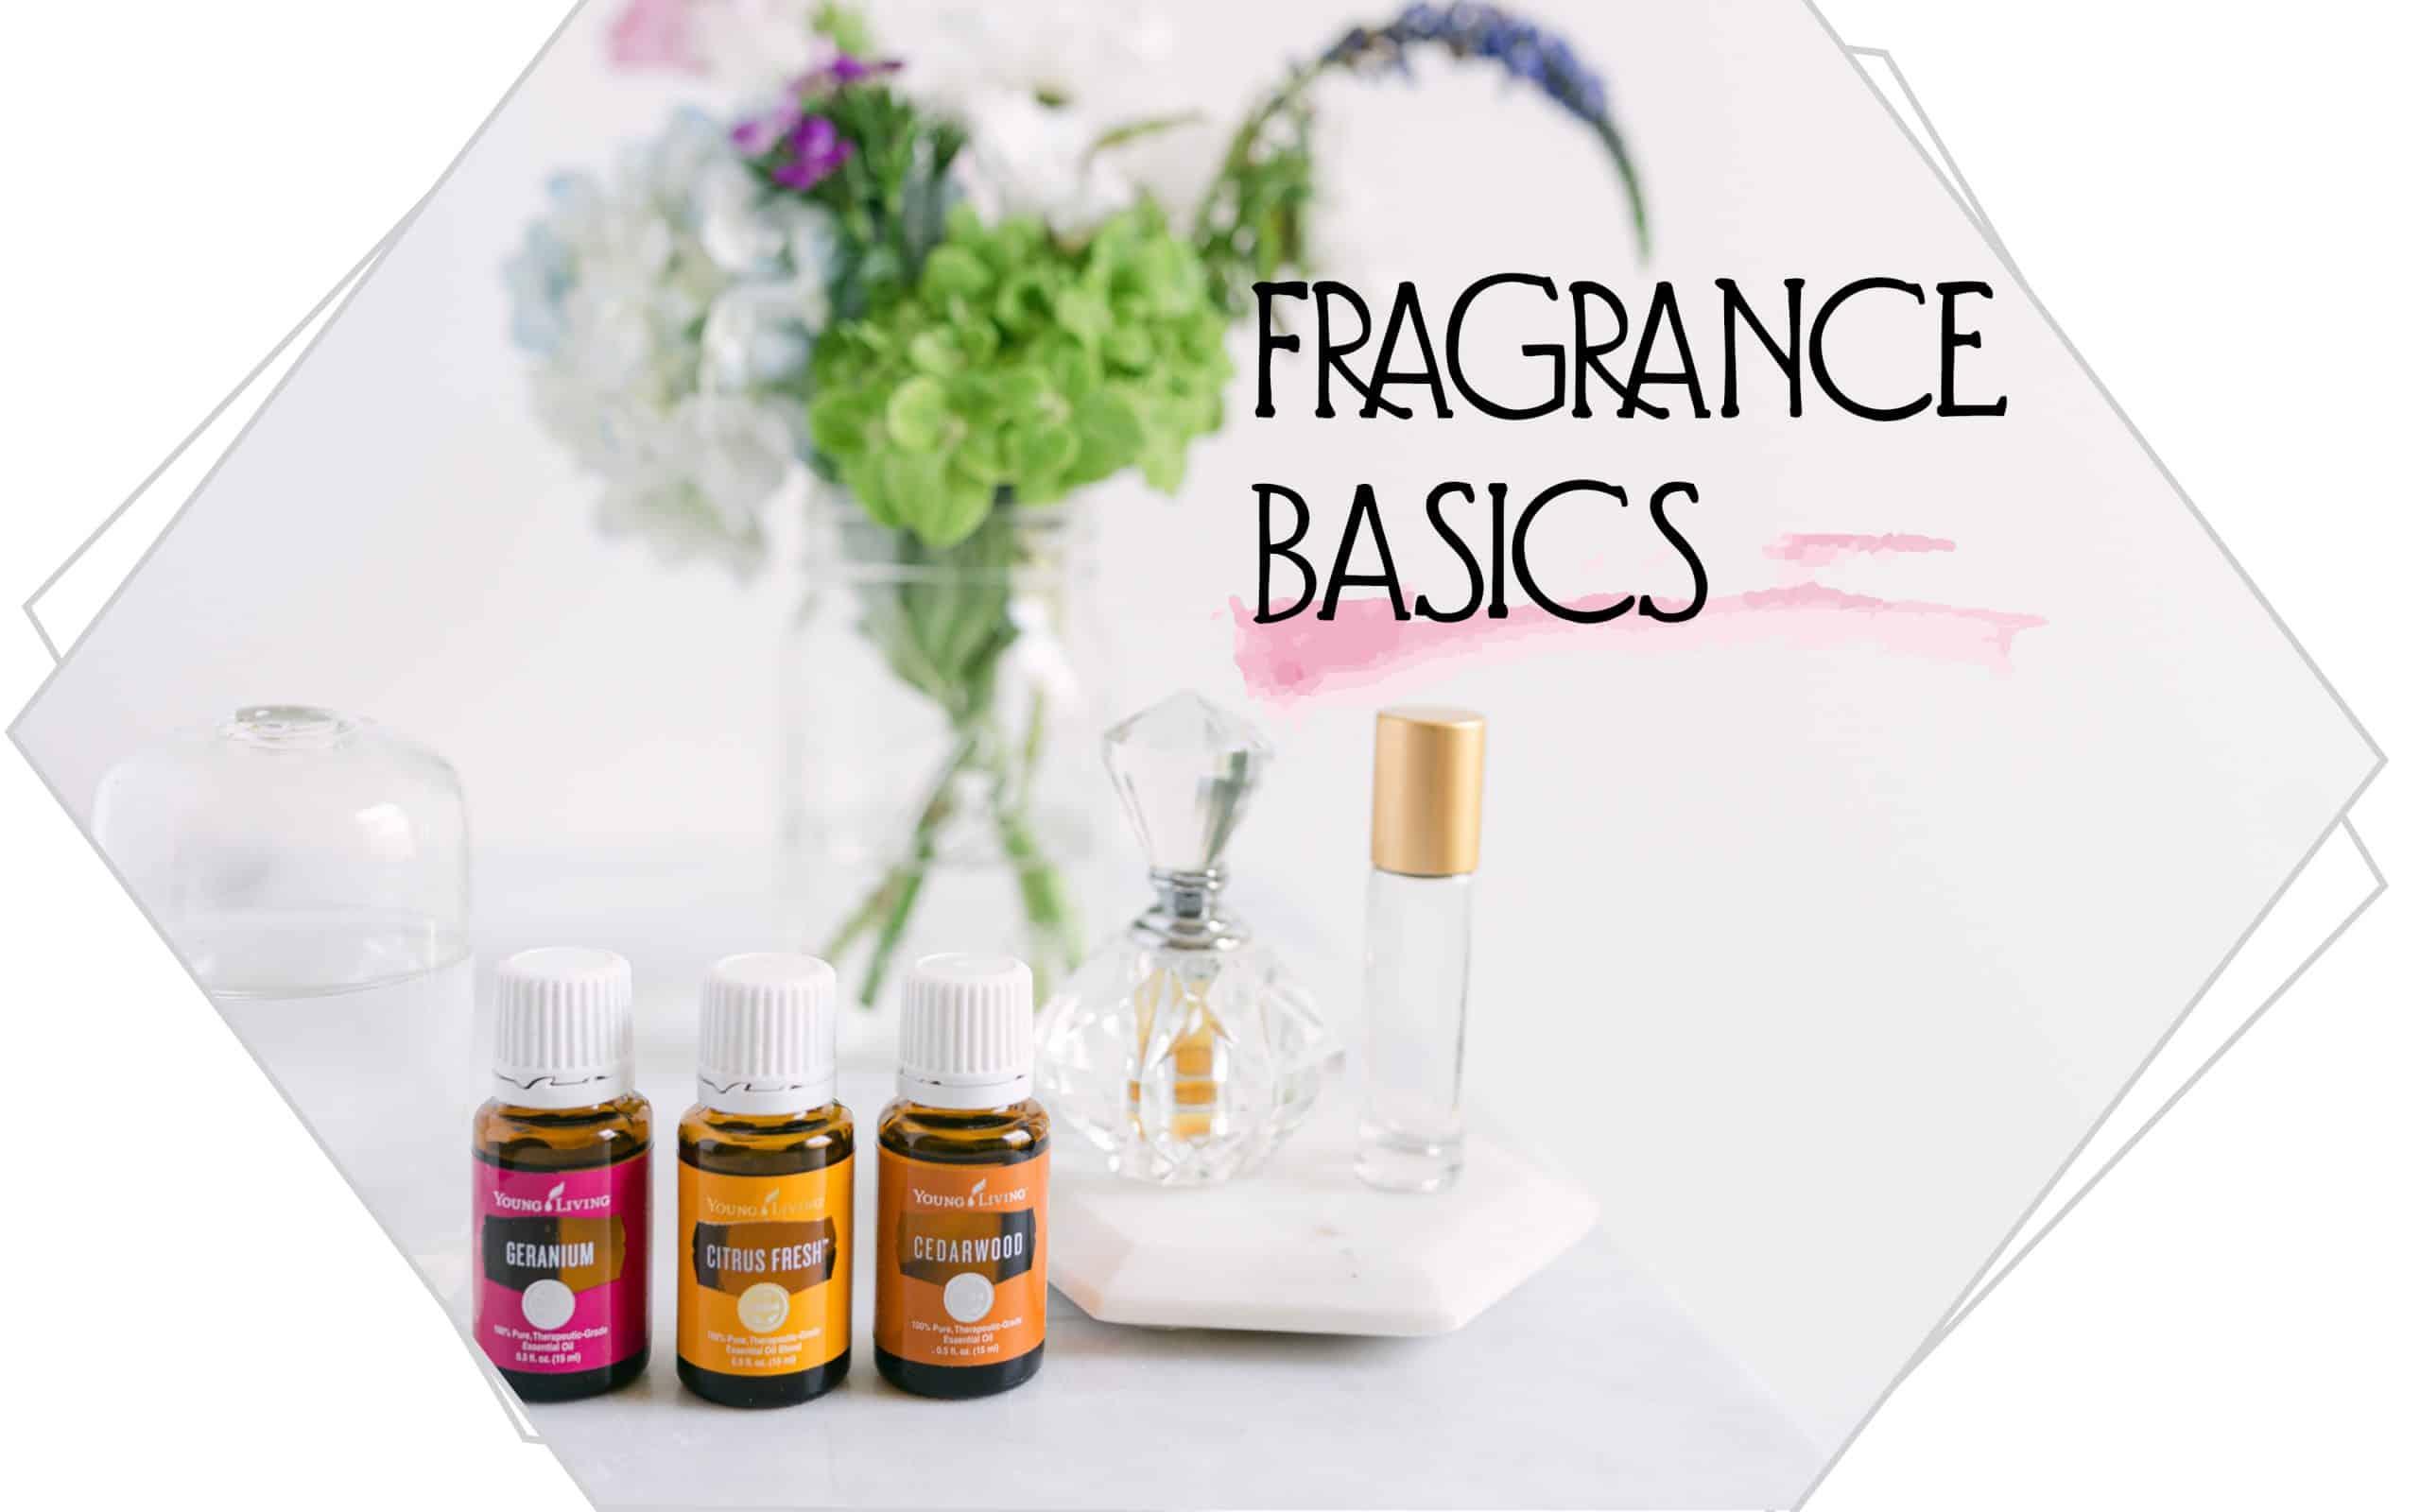 Fragrance basics with essential oil bottles.